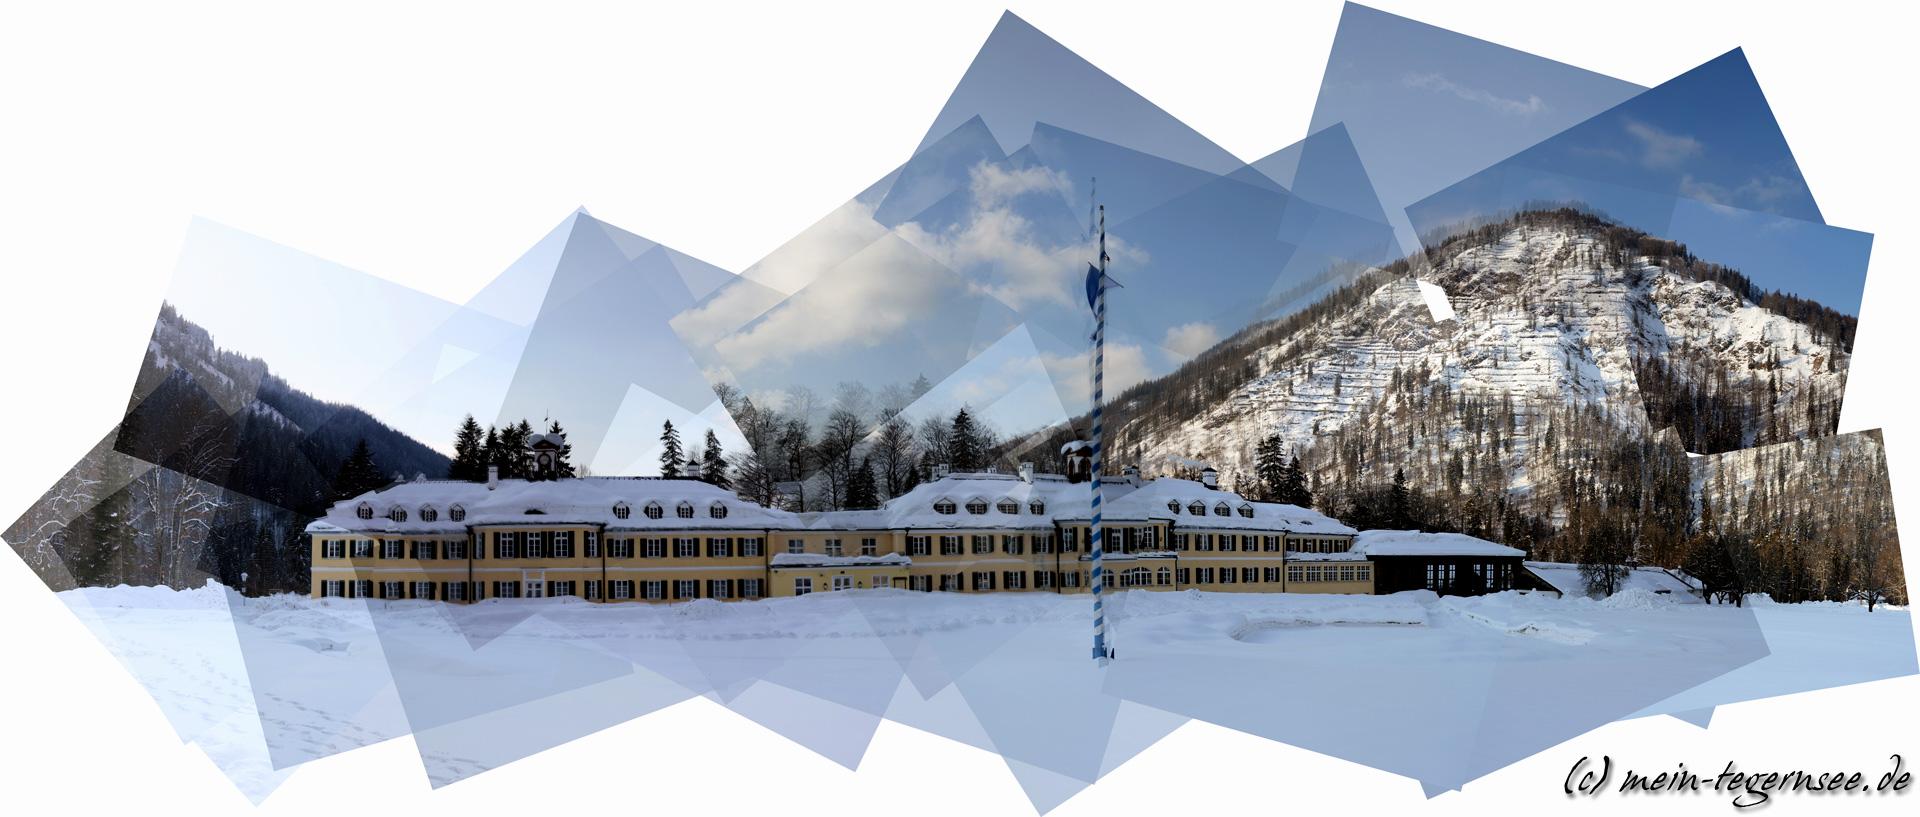 Hanns-Seidel-Stiftung Wildbad Kreuth